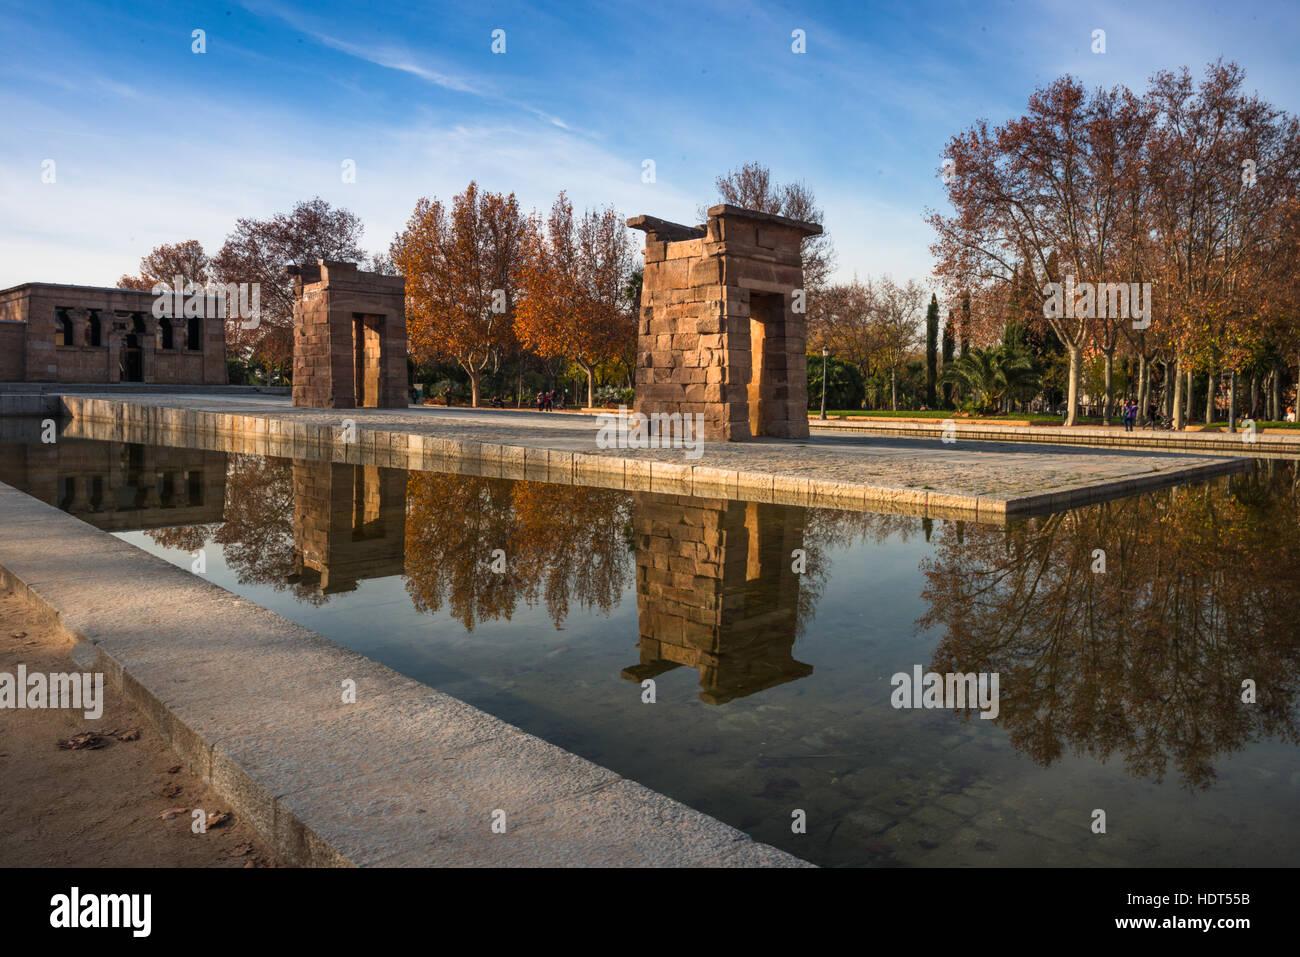 Temple of Debod. Parque del Oeste, Madrid Spain. Stock Photo